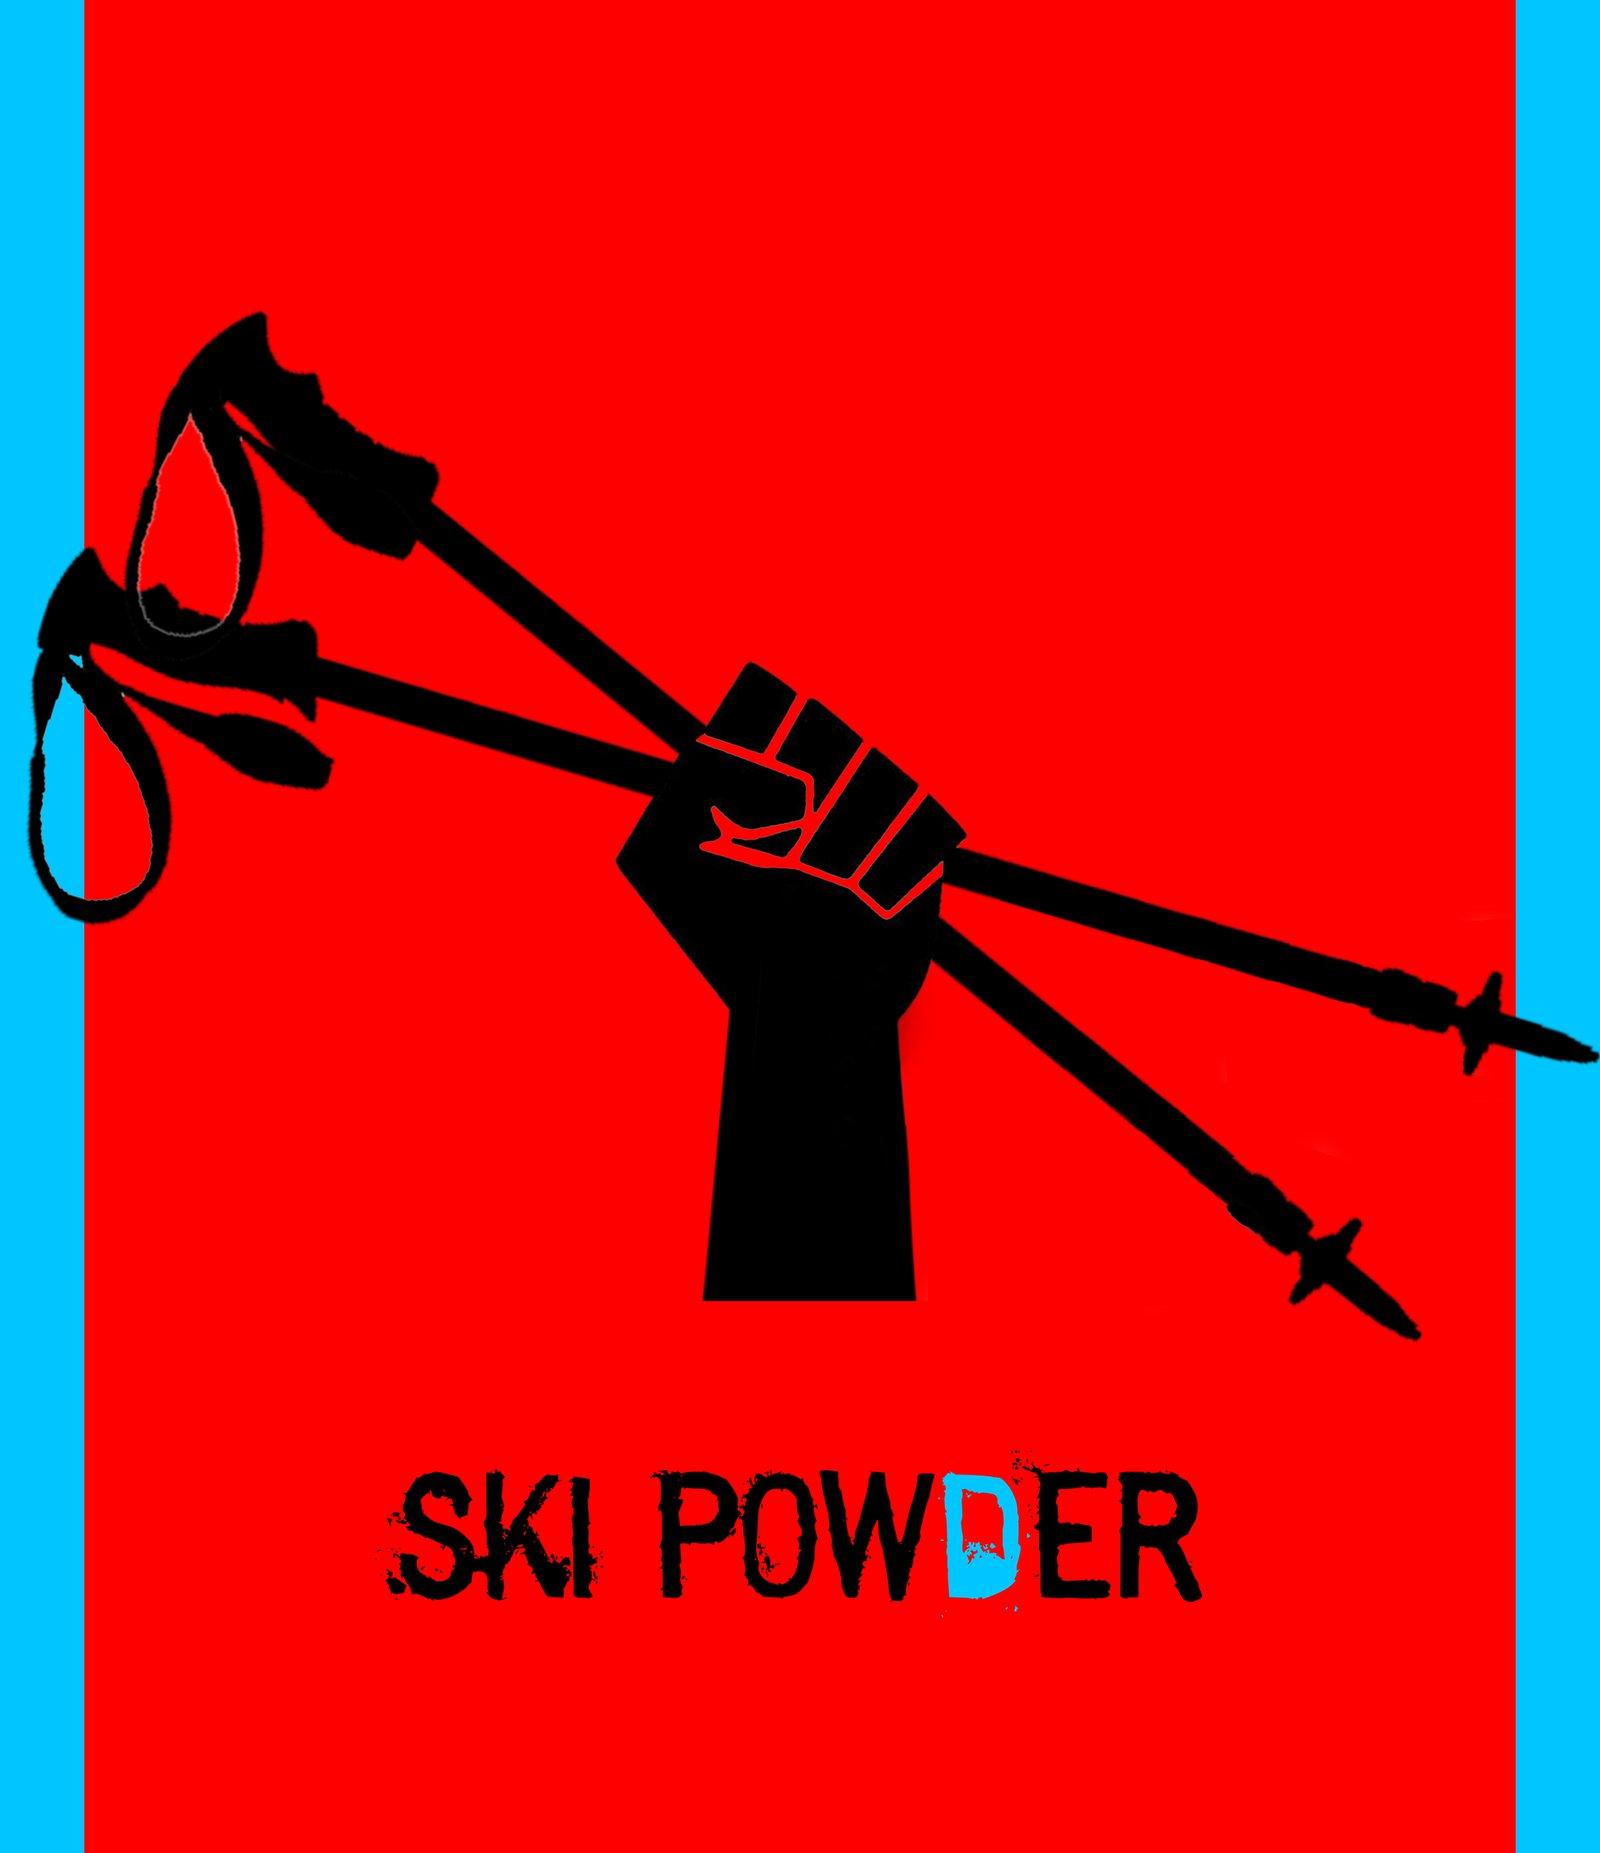 Ski Pow(d)er - 2 of 2